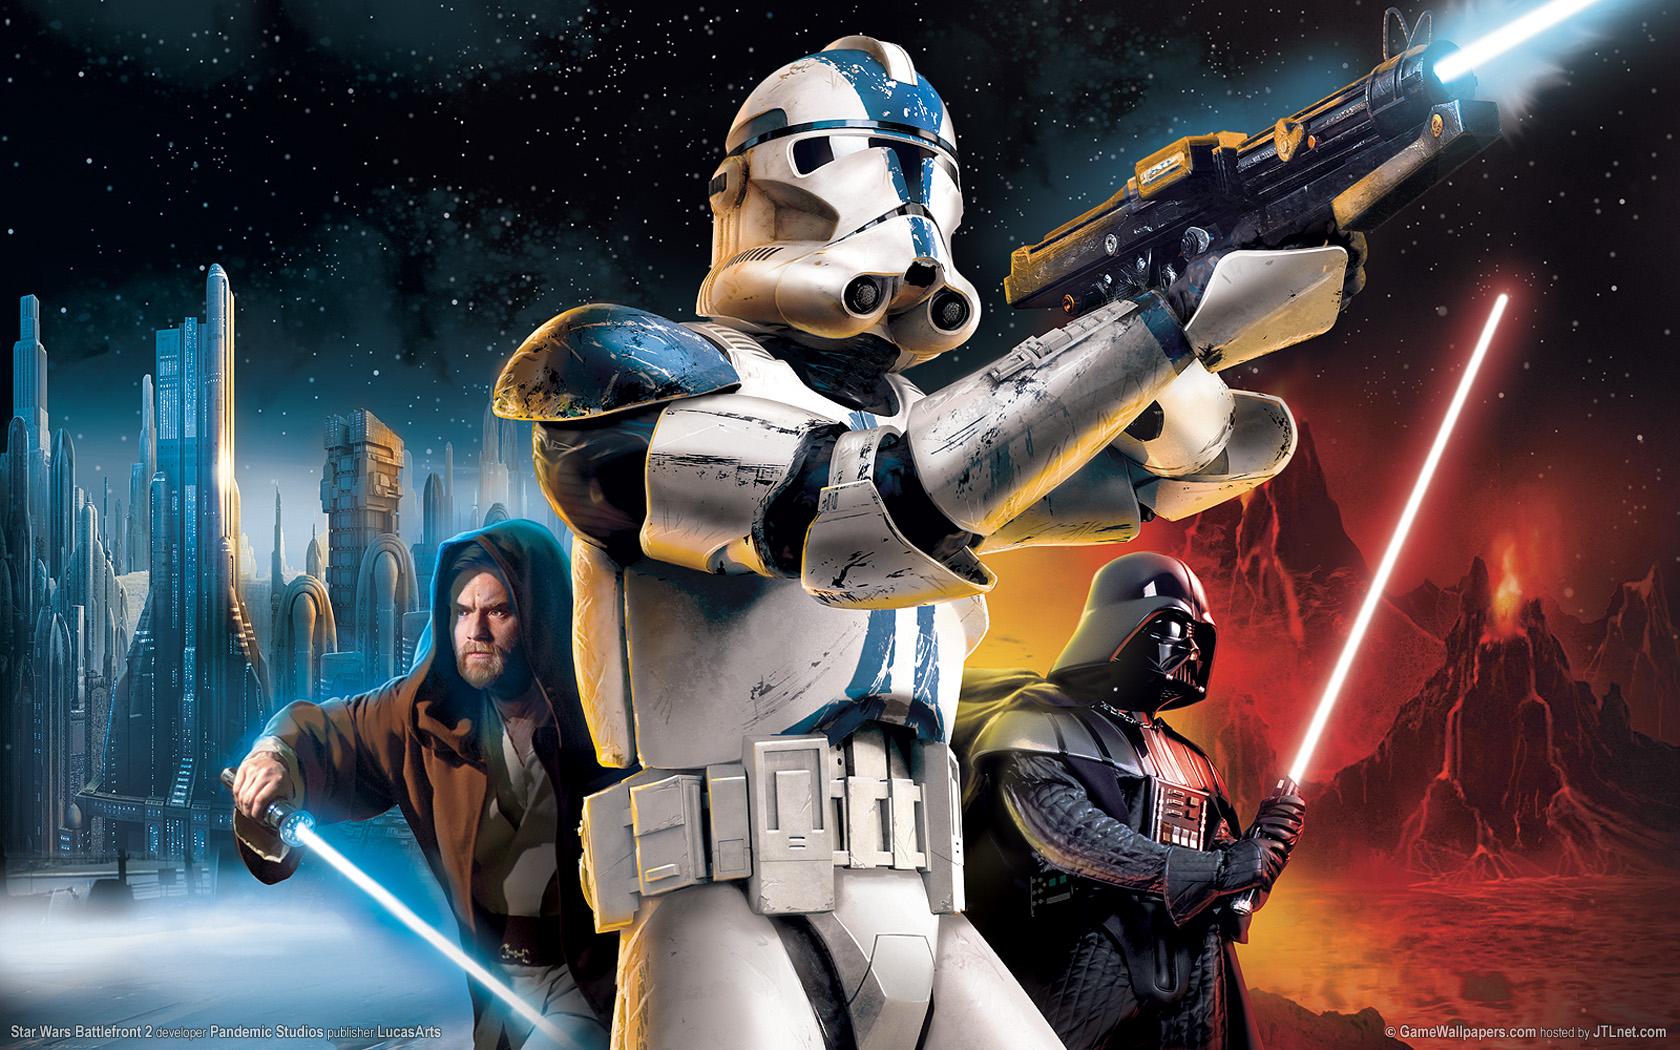 Star Wars Battlefront 2 wallpapers Star Wars Battlefront 2 stock 1680x1050